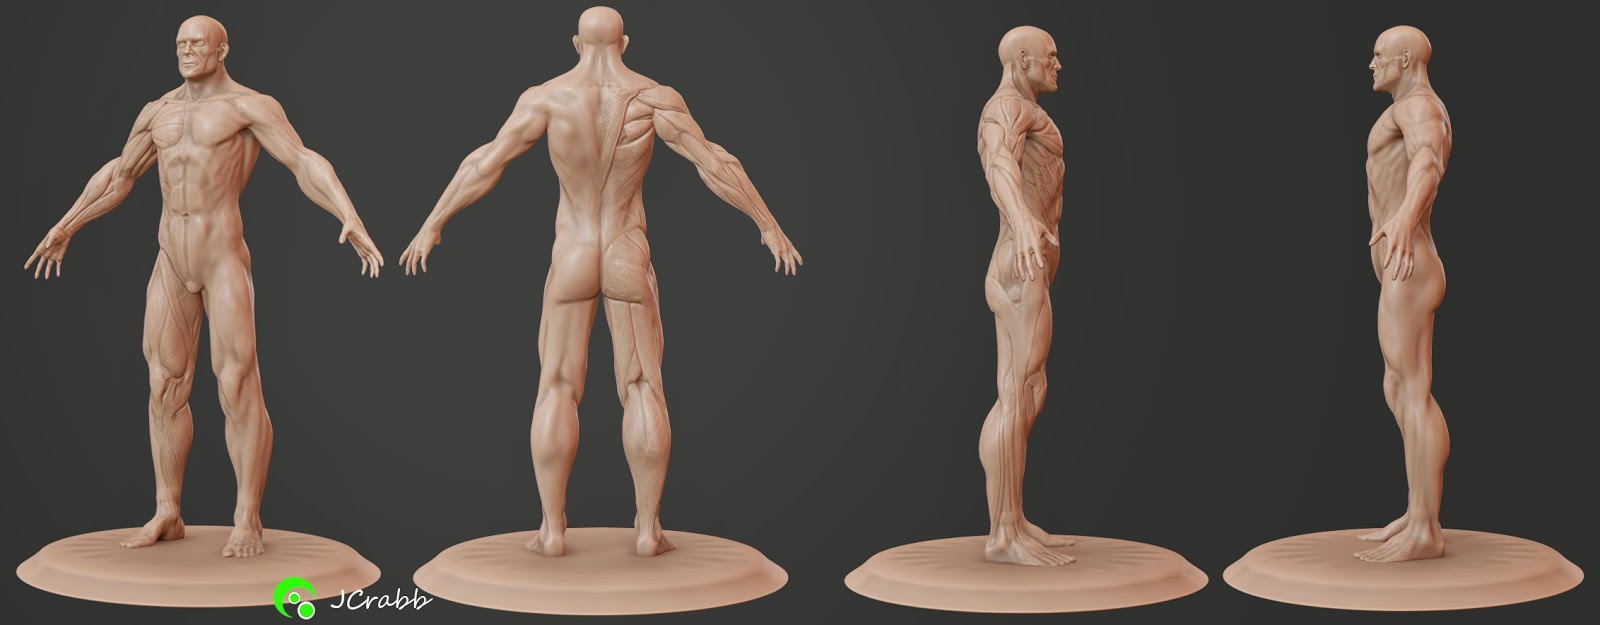 James Crabb- 3d Artist: Artist Anatomy Figurines